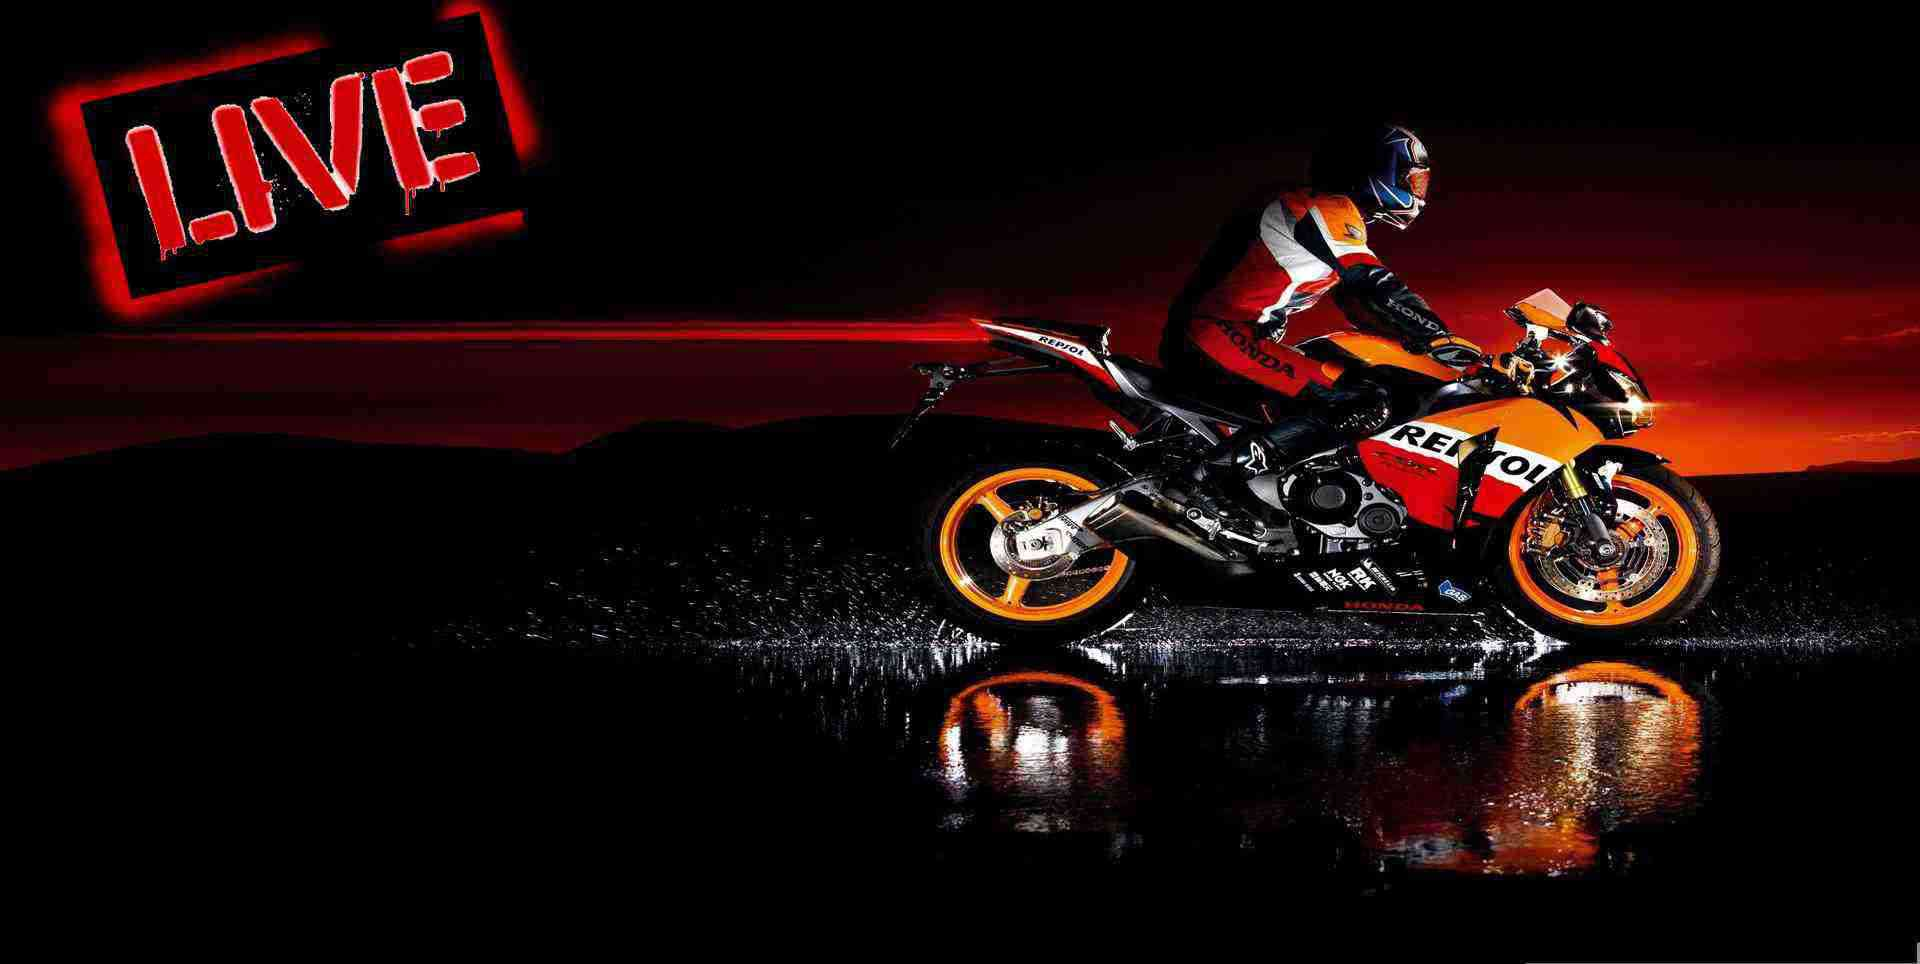 Watch MotoGP Grand Prix of Qatar Live